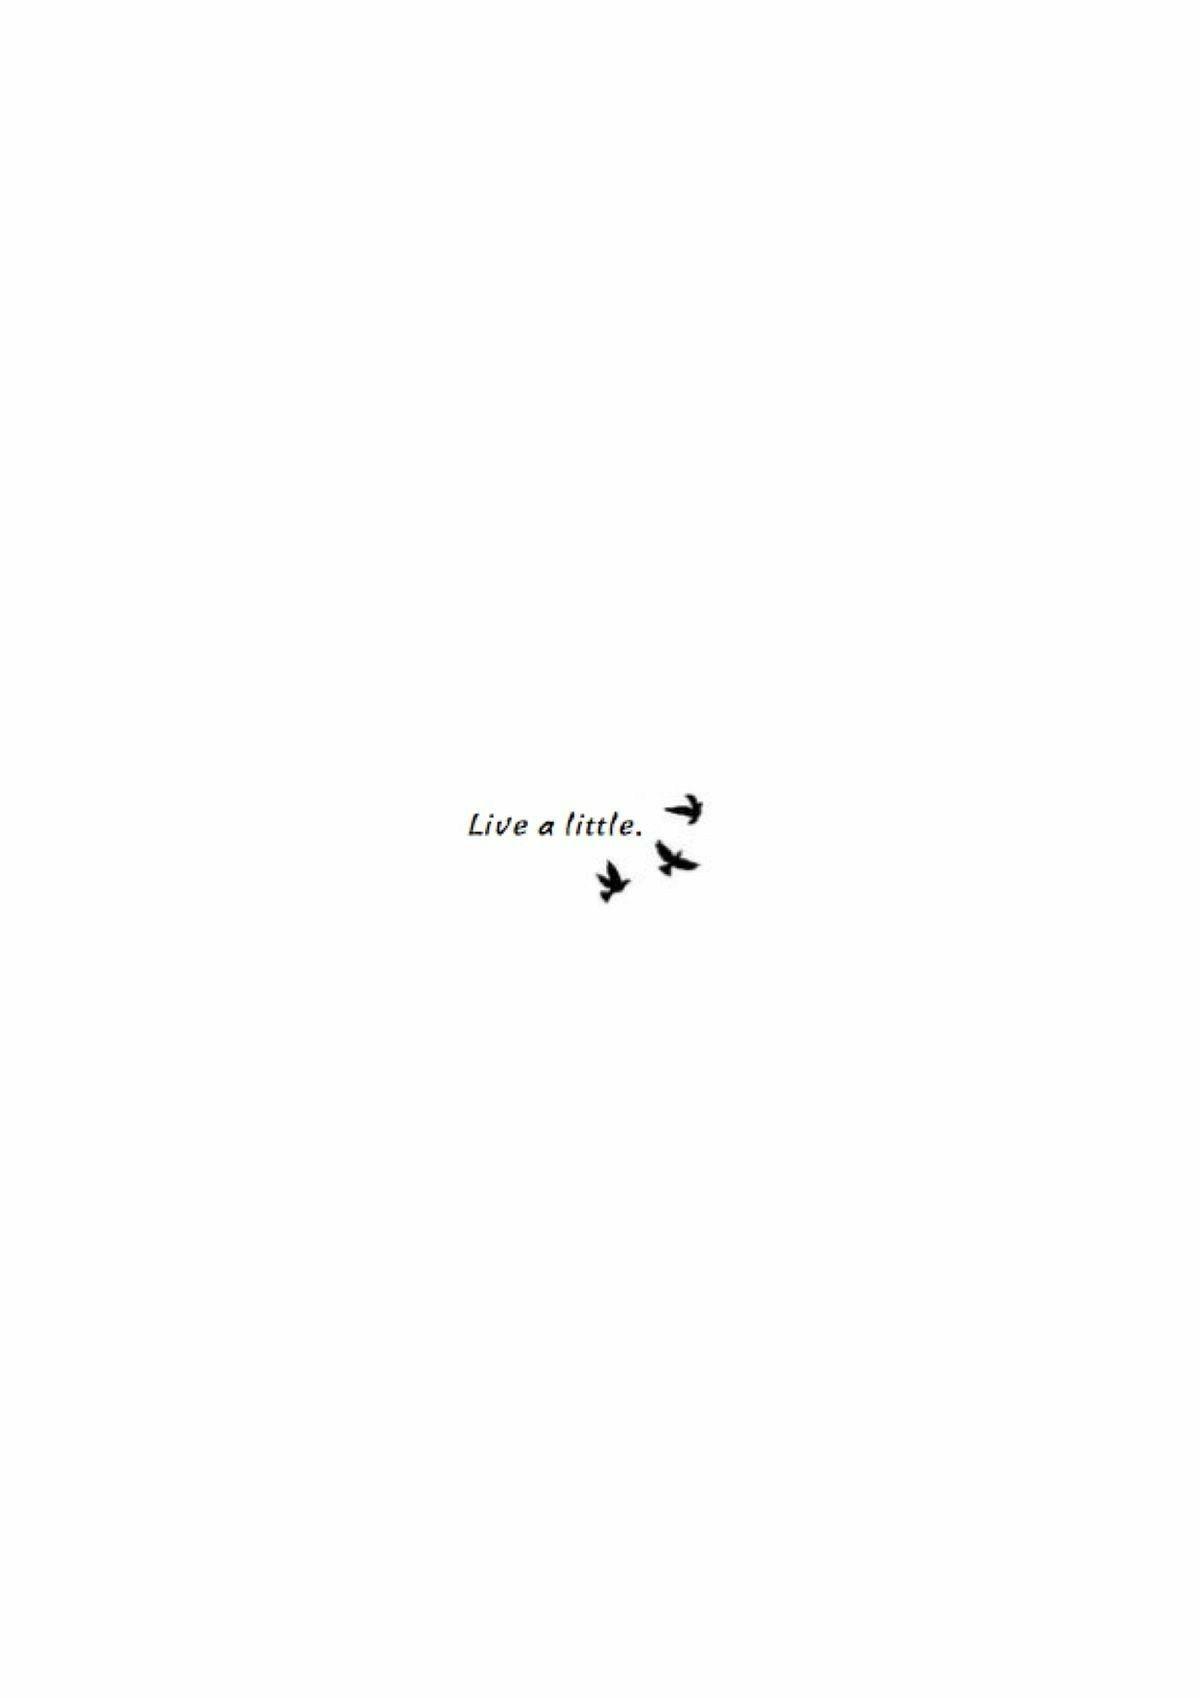 #passportstamps #henny #Subathing   #traveltheworld  #travelgram #travelholic #wanderlust #travelfeed #browngirltravel  #blackgirltravel #travelnoire #travelblogger #travelphotography #travelingblack #travelingblackwomen #blackgirlmagic #travelblack #blackgirljoy #TravelGoals #blackgirlfly #mytravelgram #blackbloggers #outfitinspiration #fashion #nightoutfashion  #catchflightsnotfeelings #blacktravelfeed #travelopolis